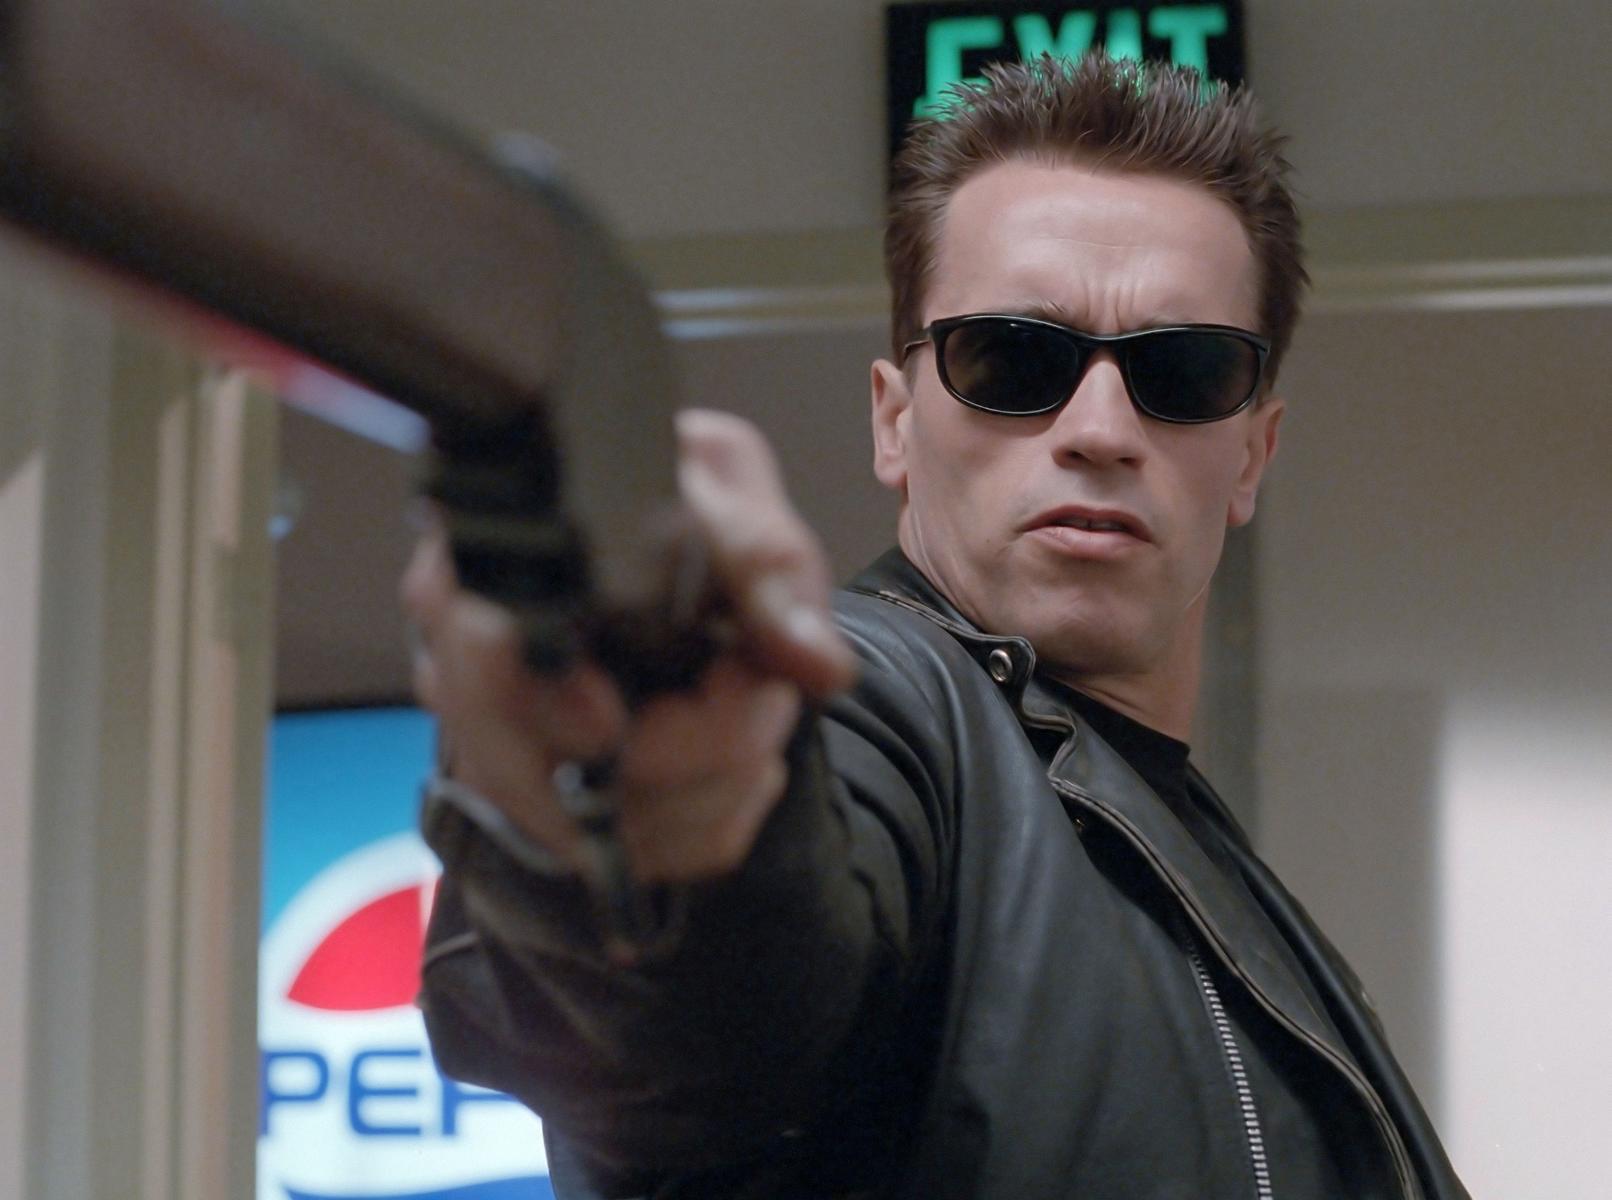 Terminator 2 release date in Melbourne